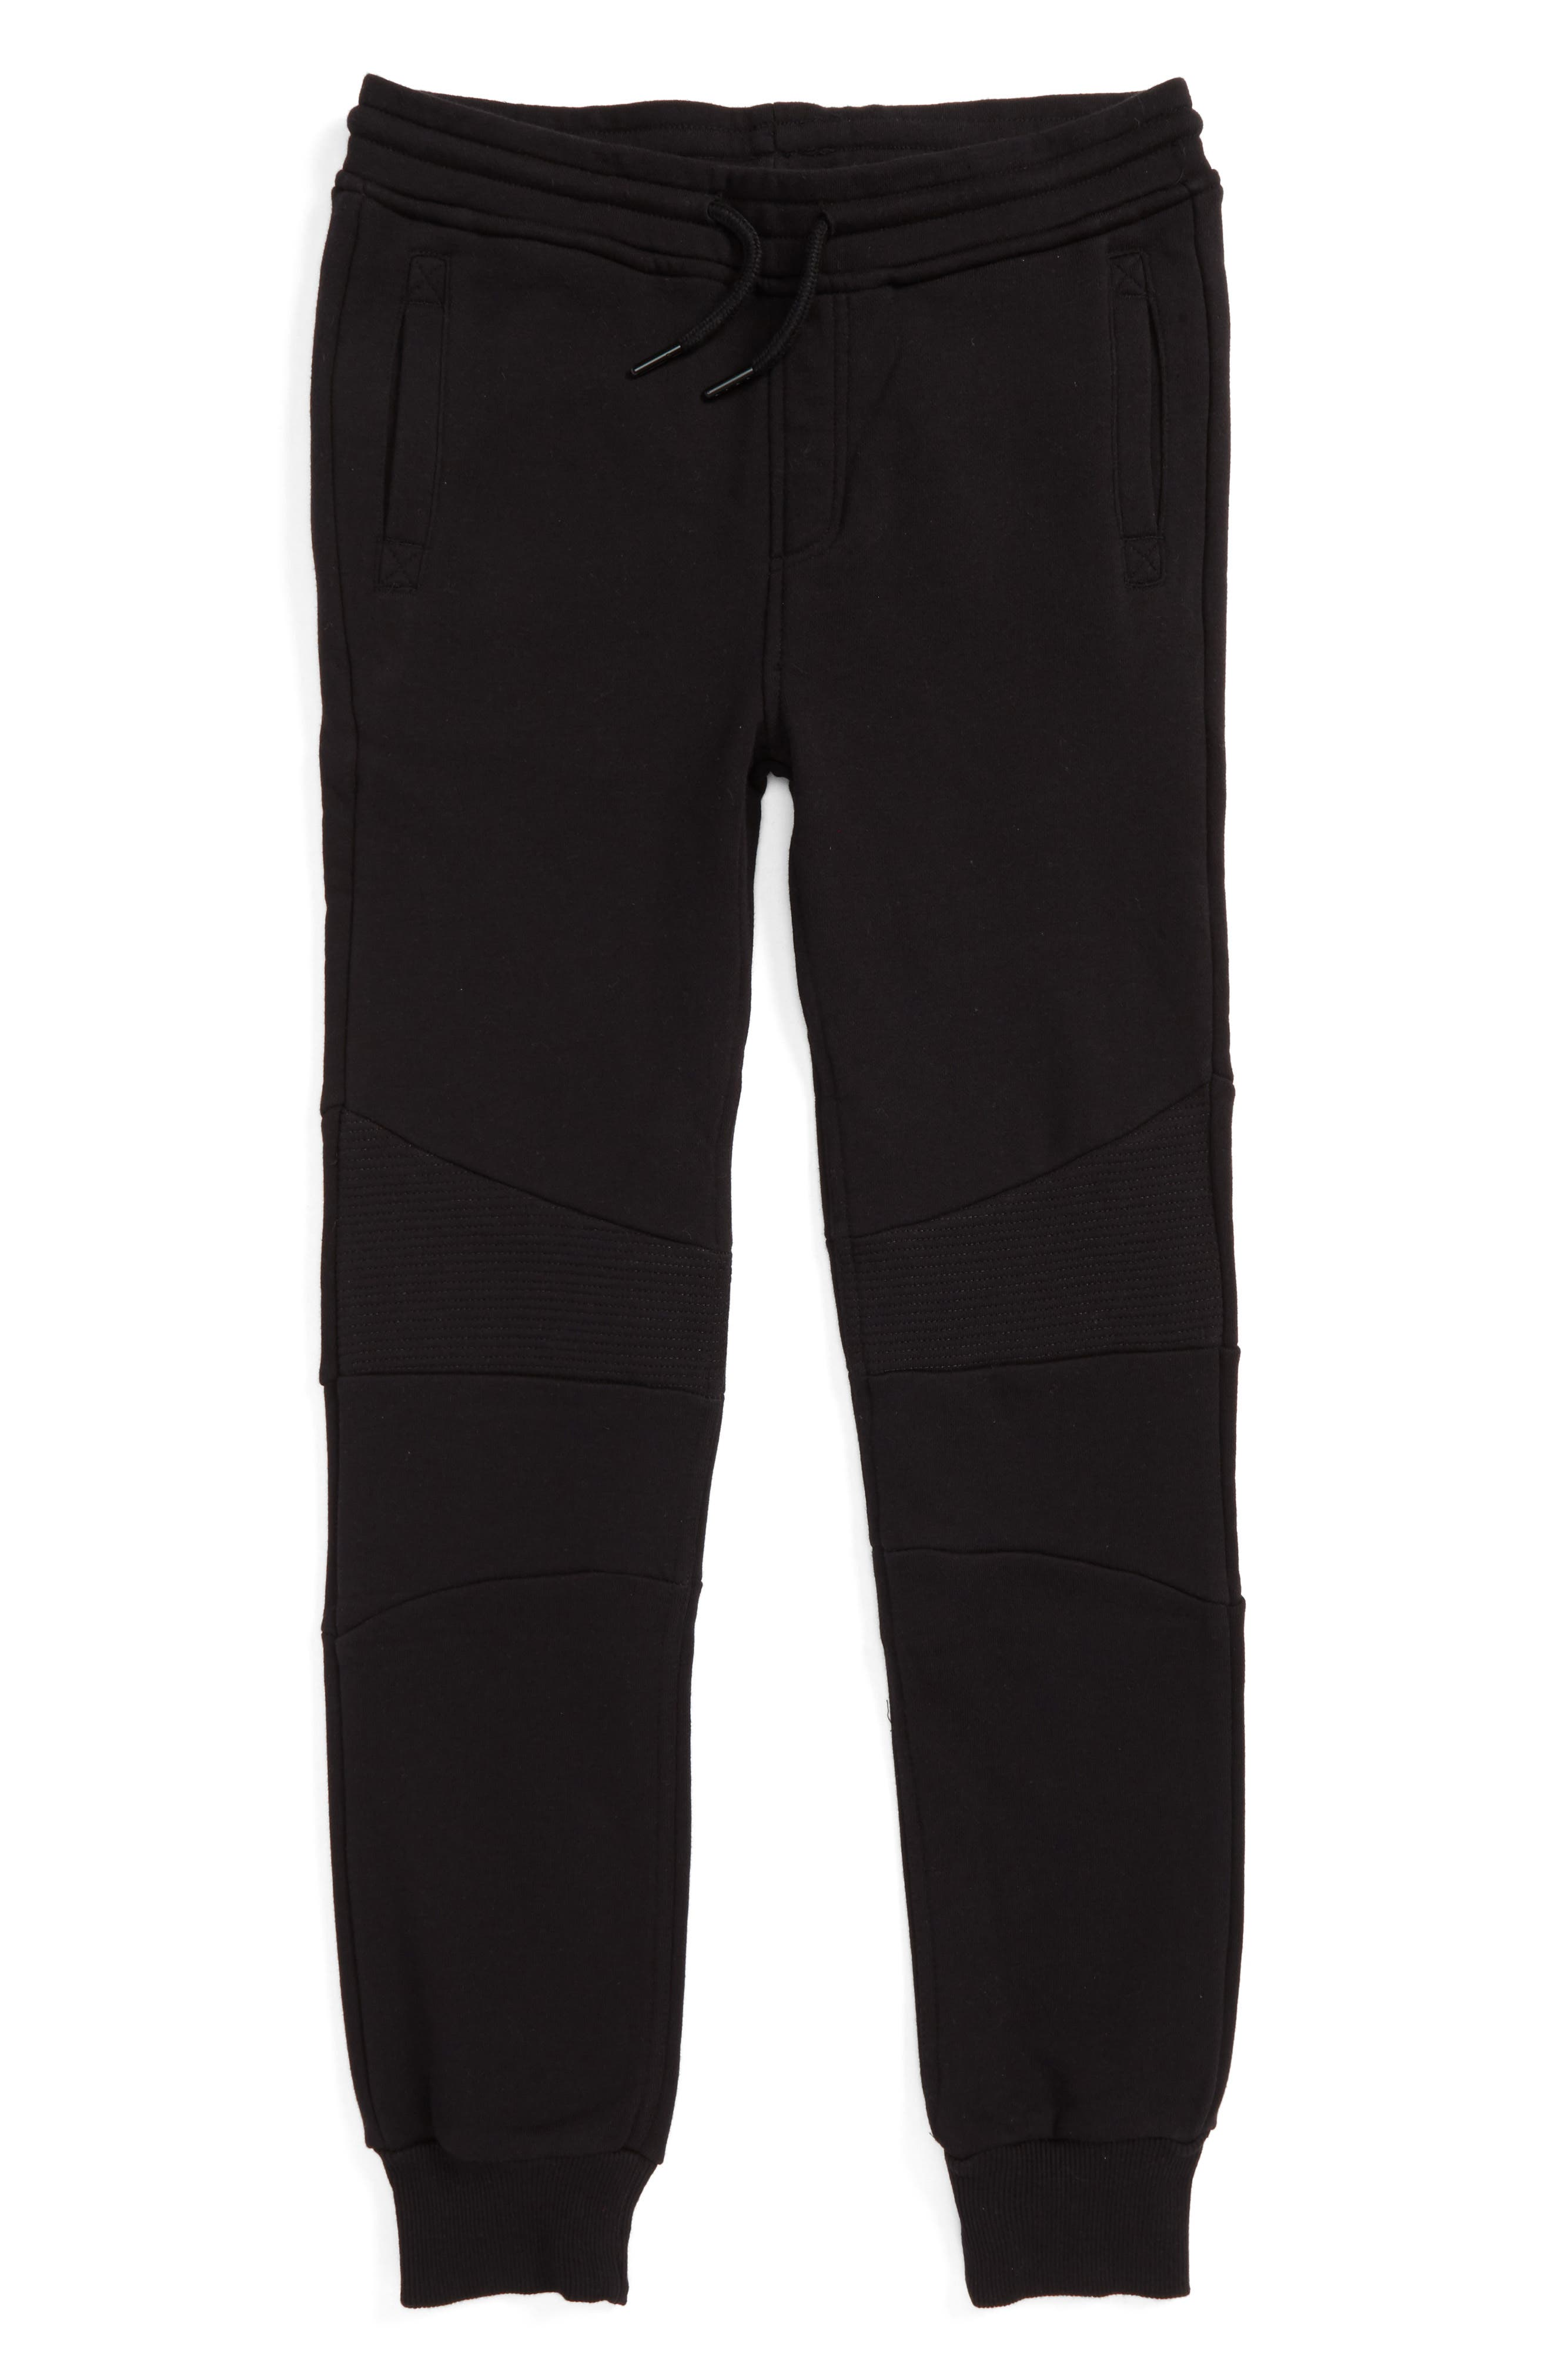 Alternate Image 1 Selected - Superism Julius Knit Jogger Pants (Big Boys)